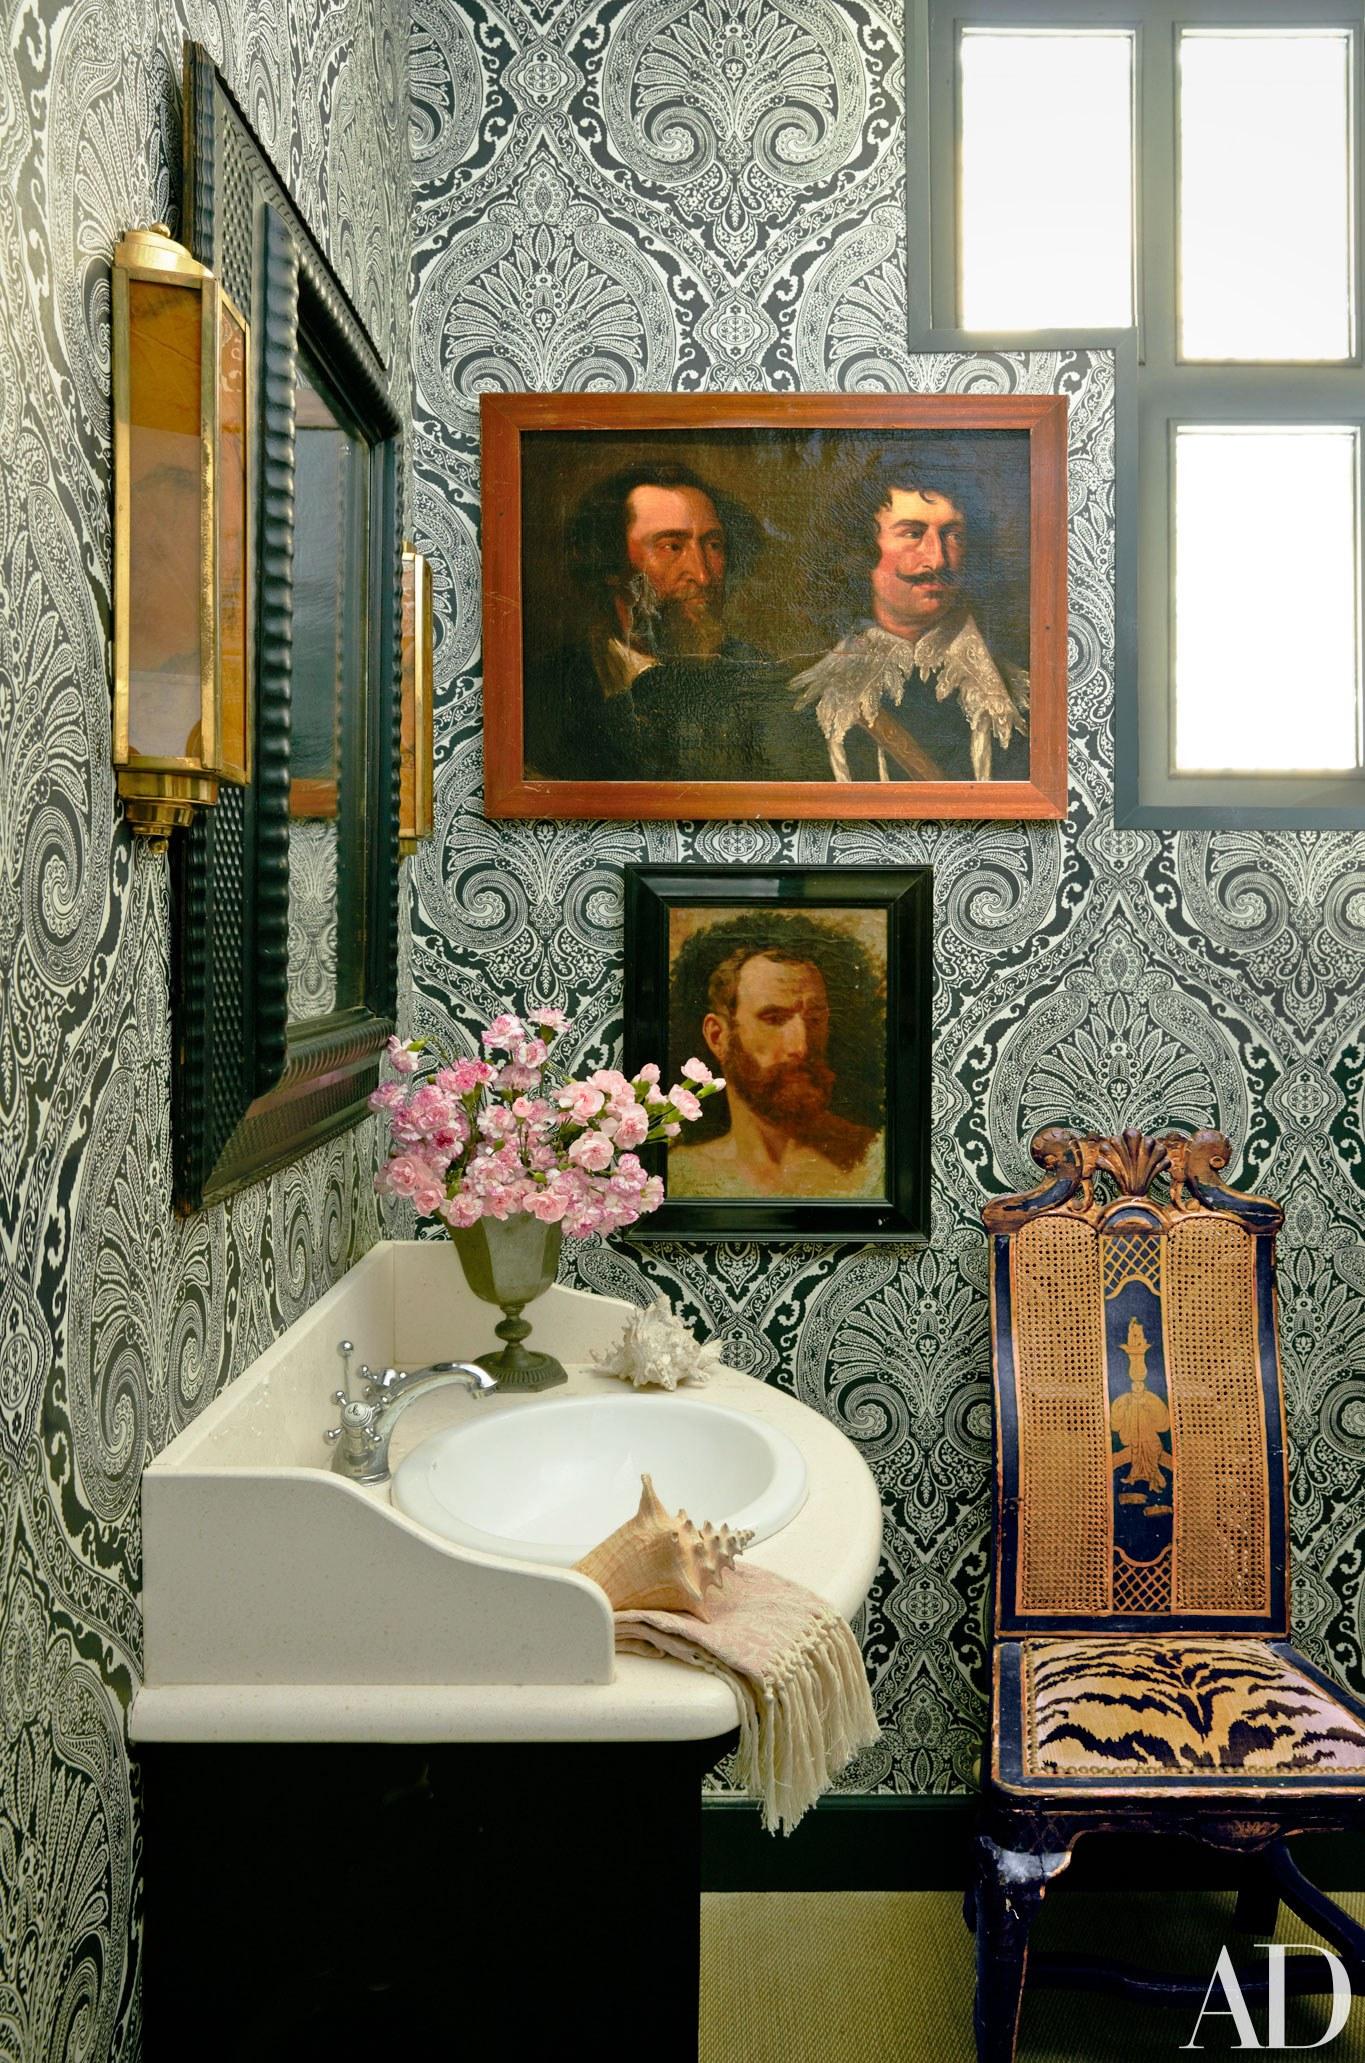 Lorenzo Castillo | The Allure of Antique Portraits | Interiors for Families